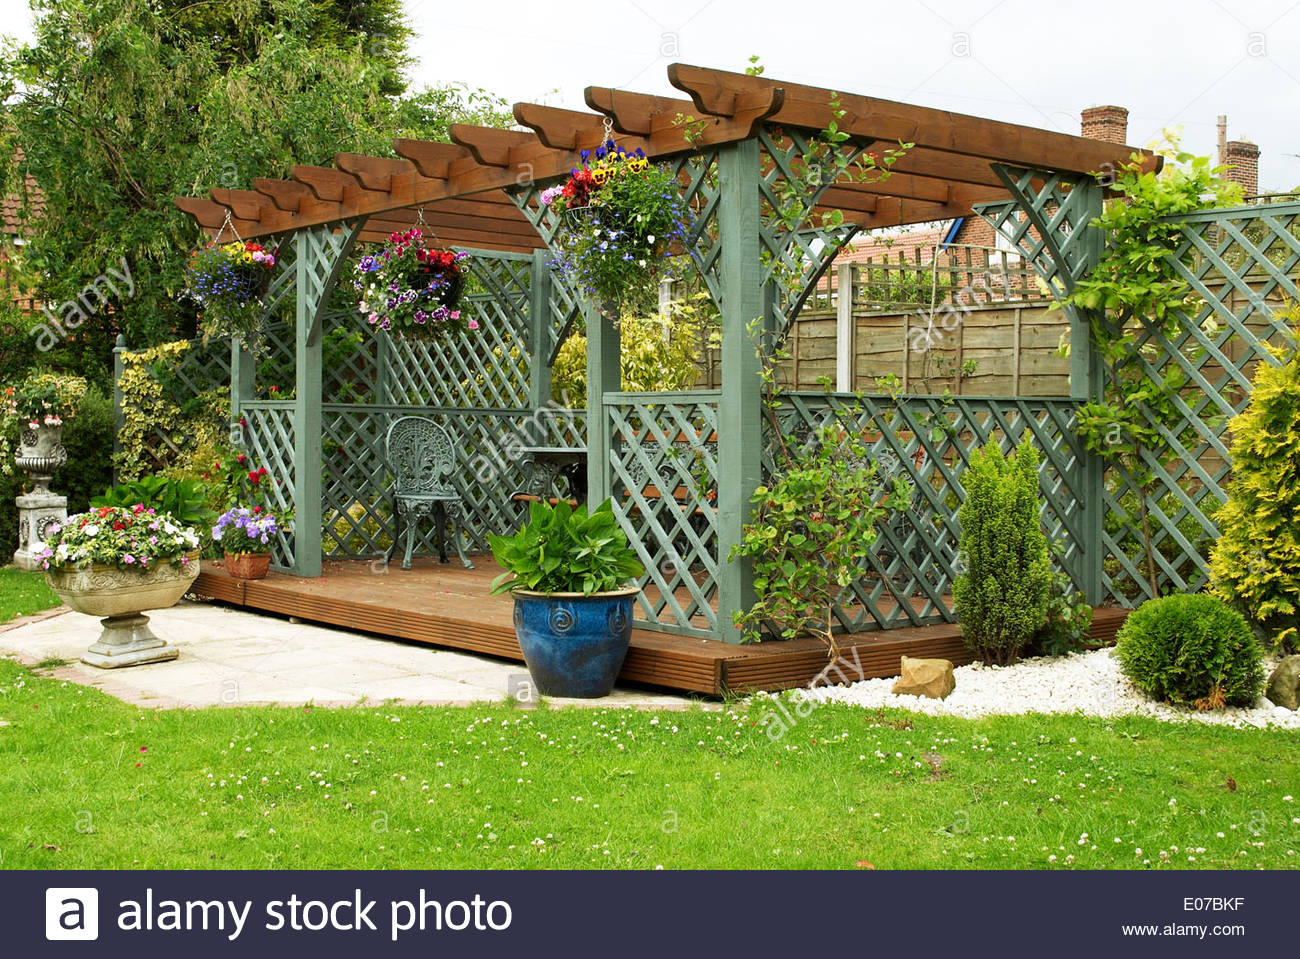 Pergola In An English Garden Stock Photo Alamy